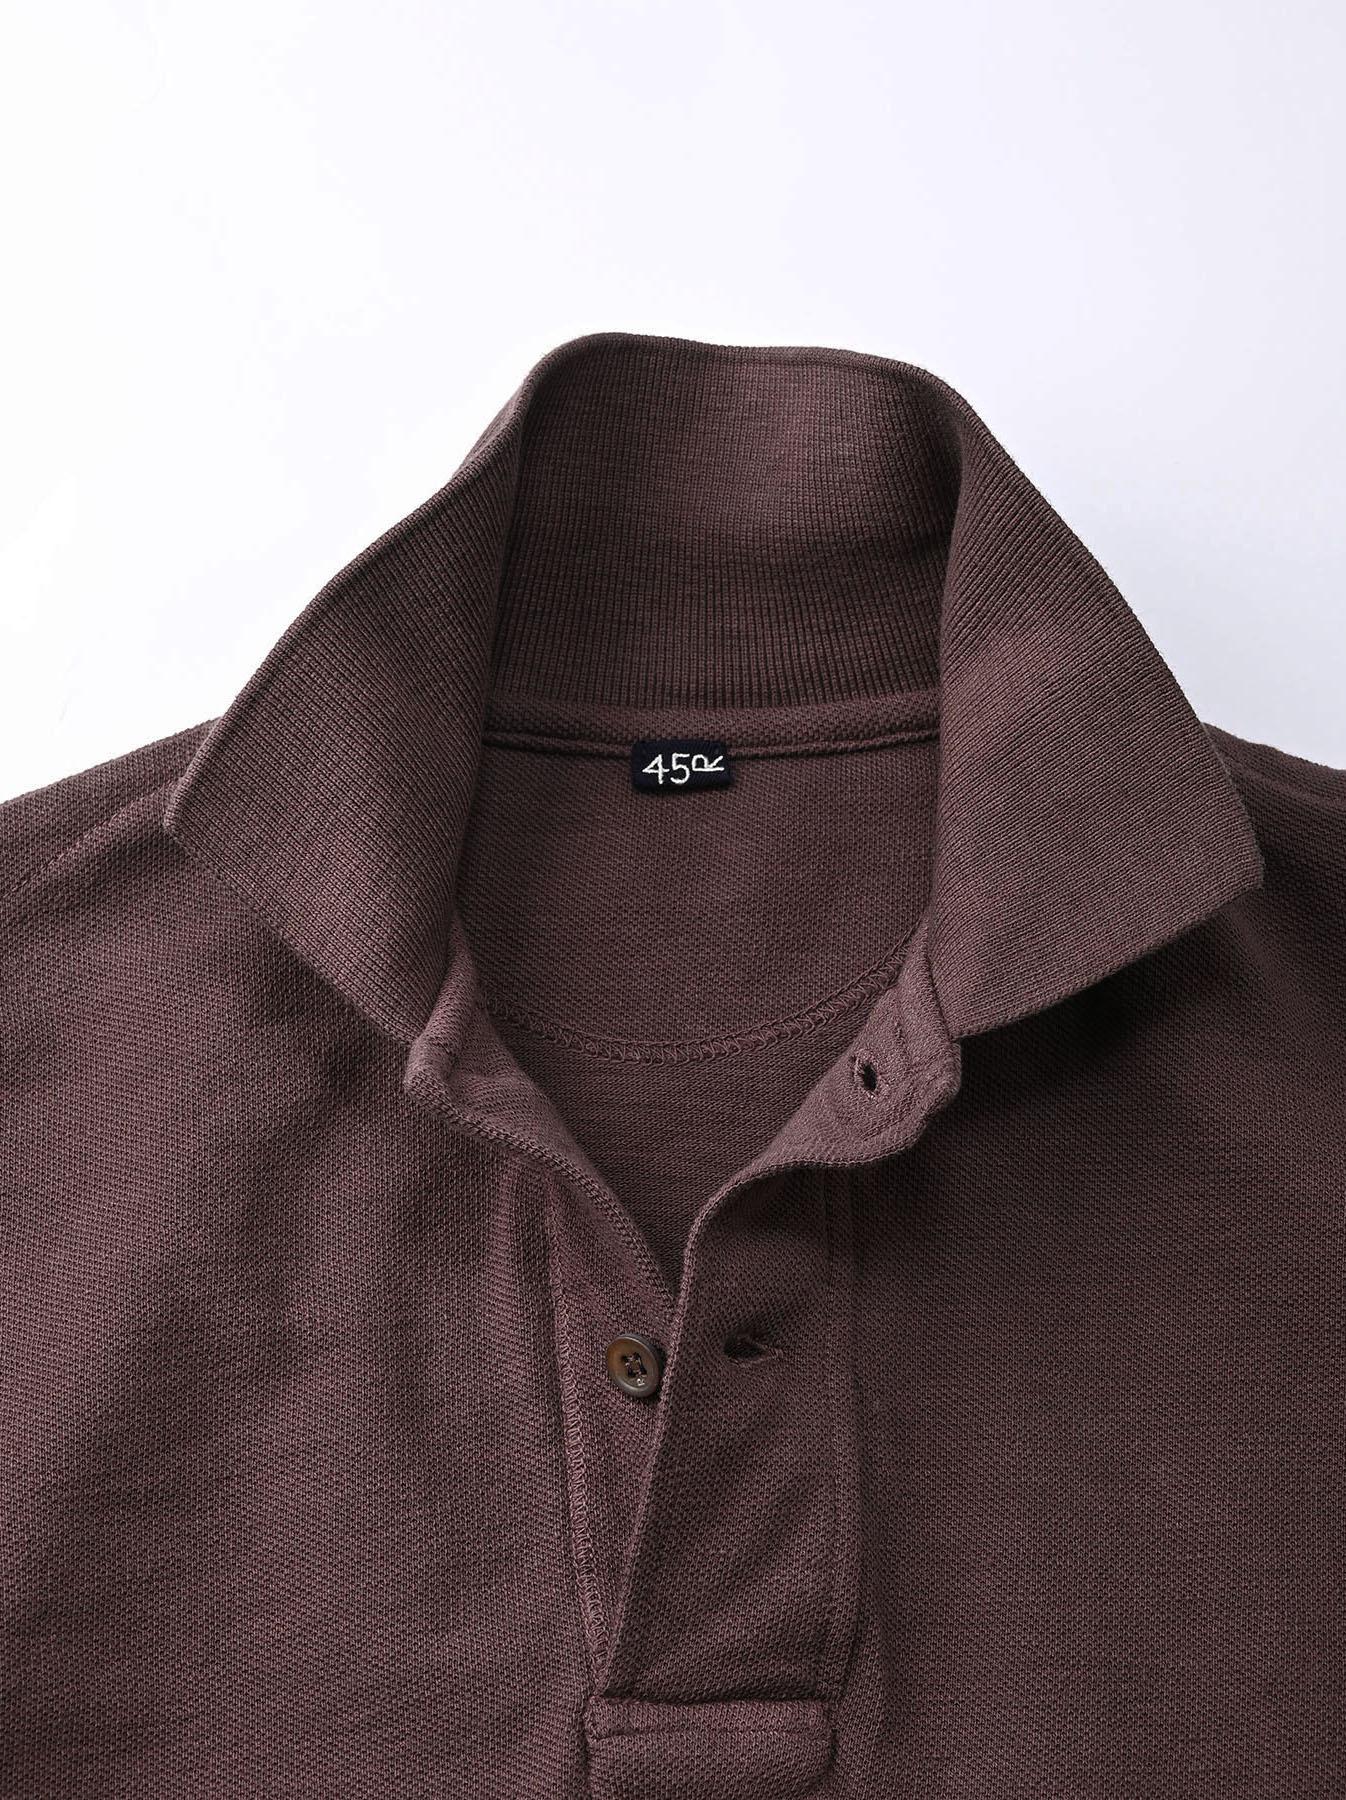 Kanoko Shiokaze Long-sleeved Square Polo Shirt (0521)-9